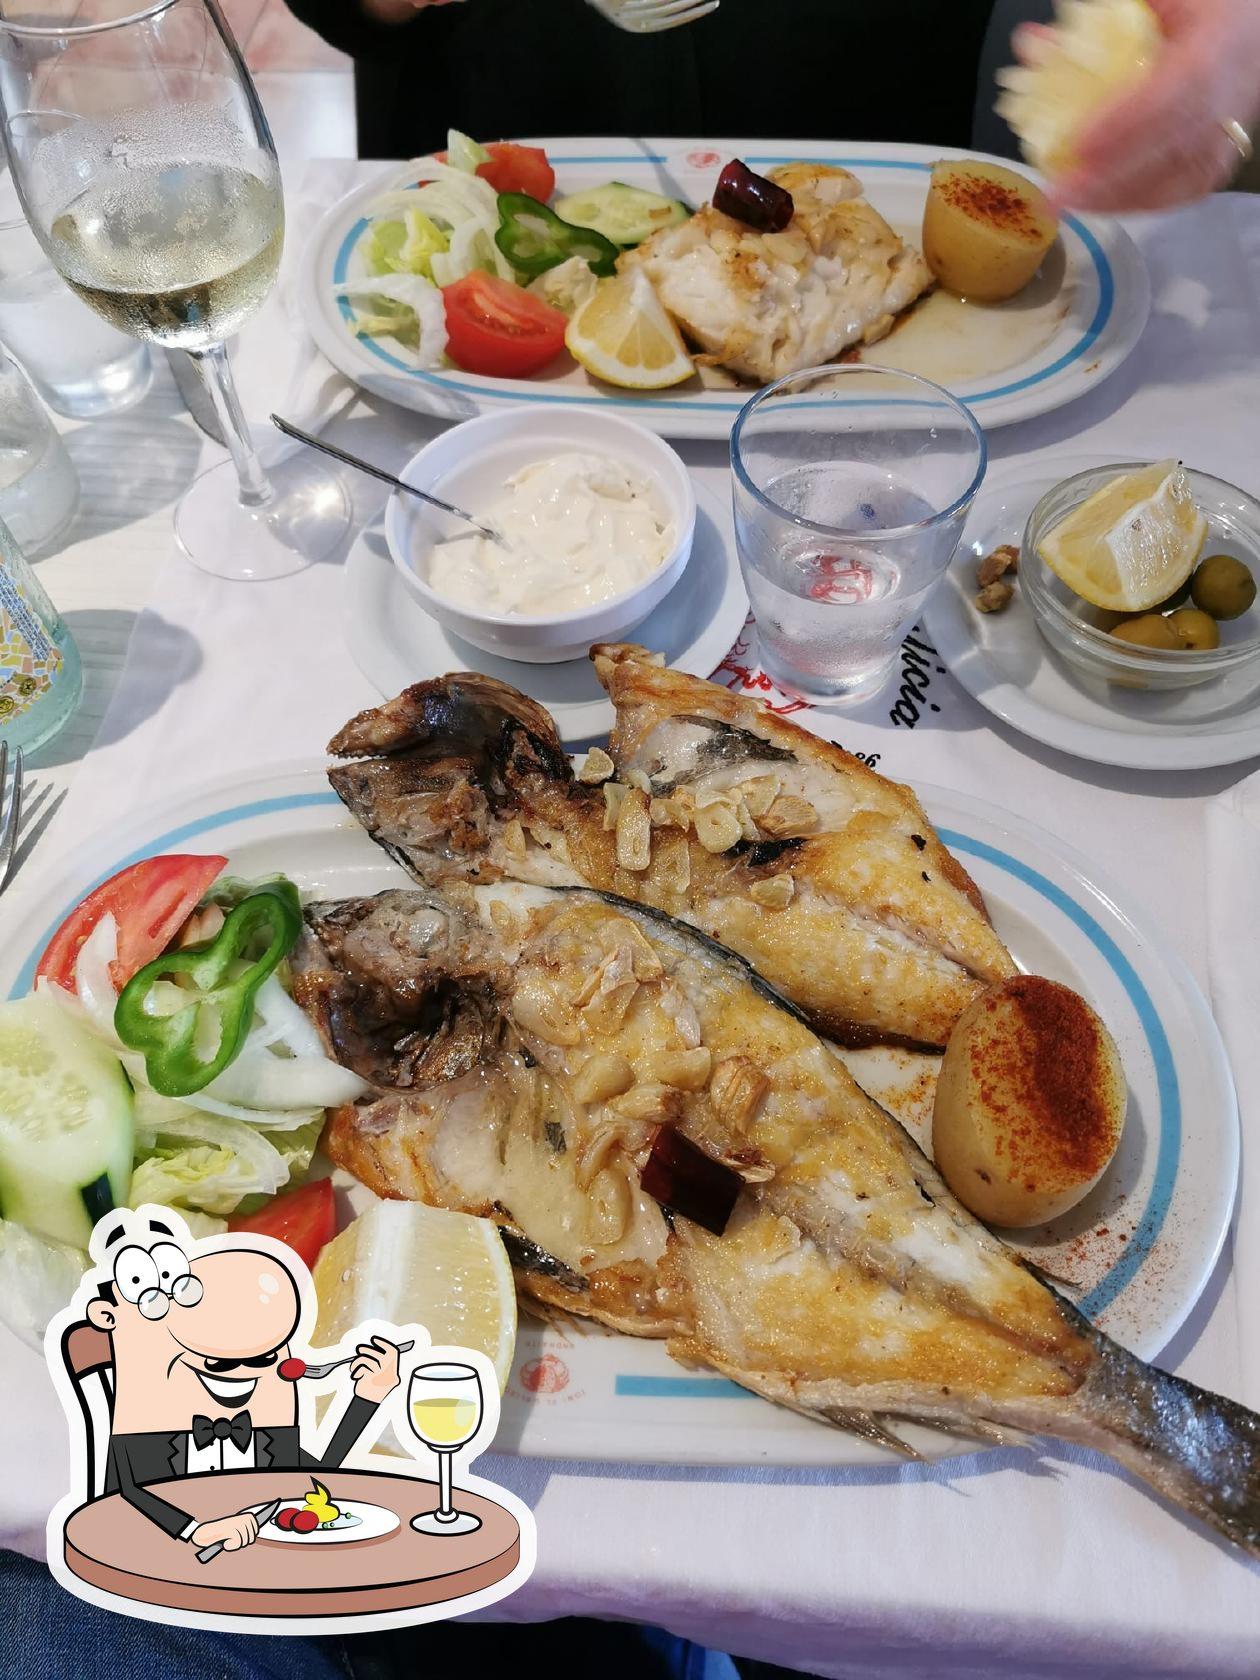 Meals at Marisquería Galicia